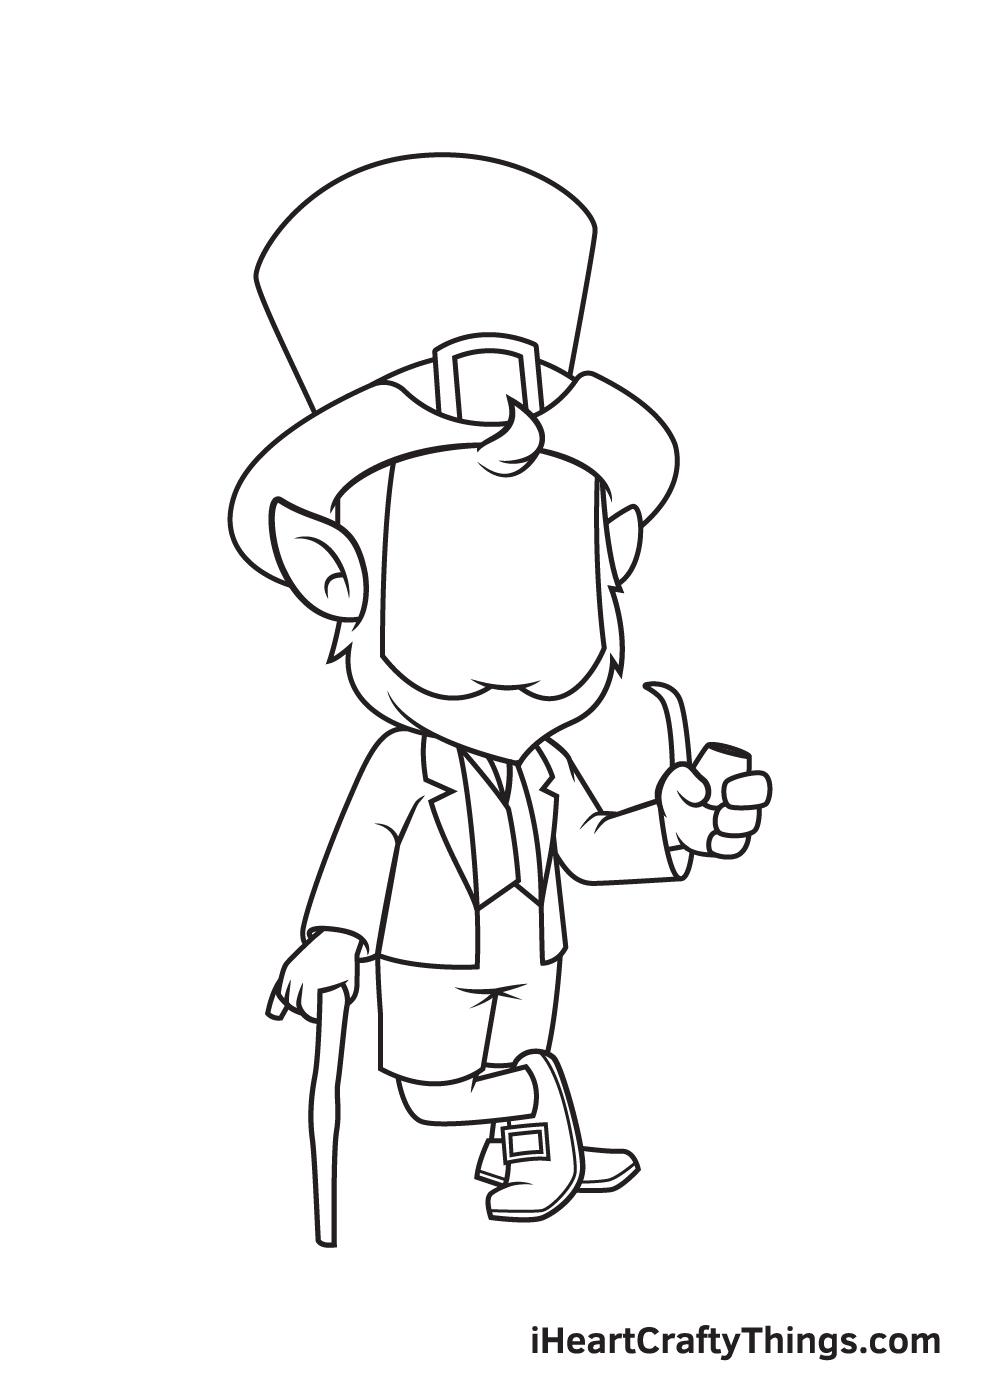 Leprechaun Drawing – Step 5